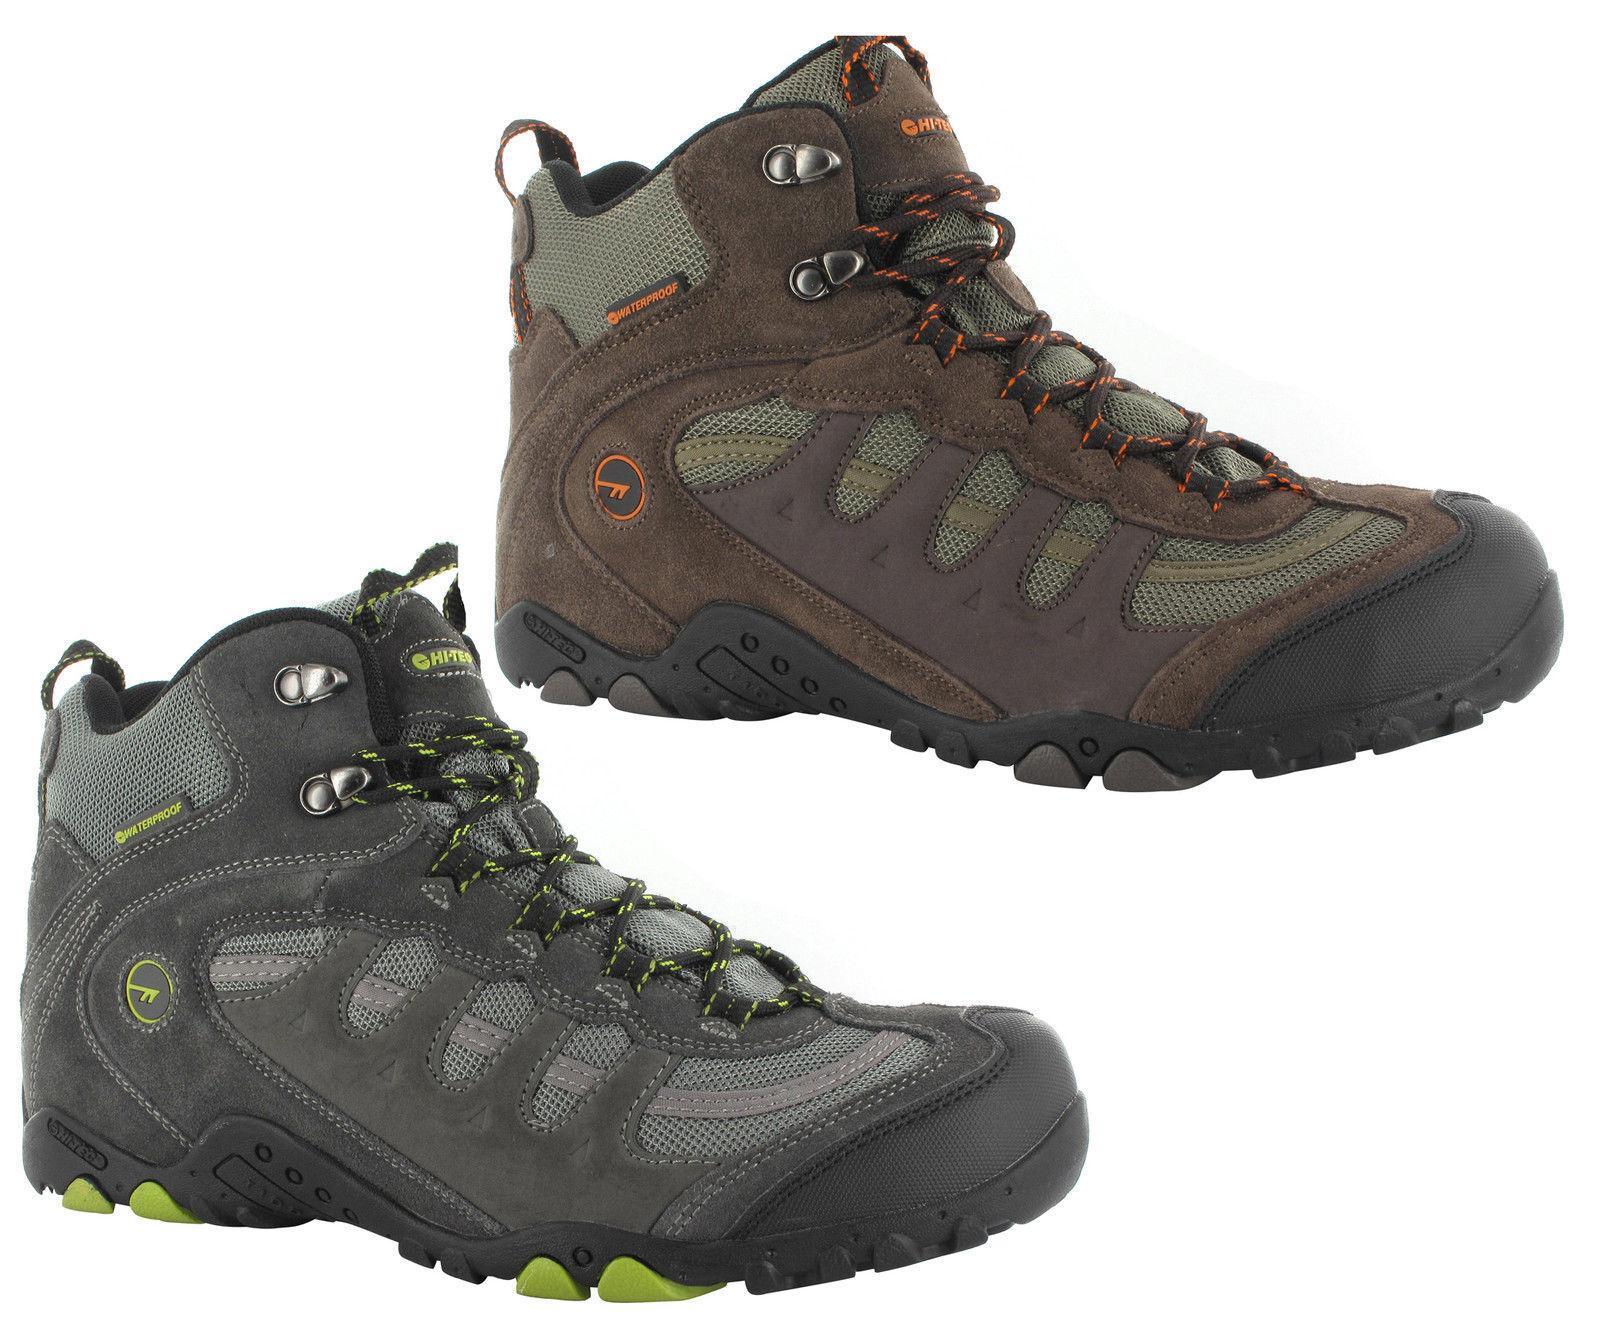 1cac555b4c2 Hi-Tec Penrith Mid Waterproof Mens Walking Trail Hiking Boots UK7-14